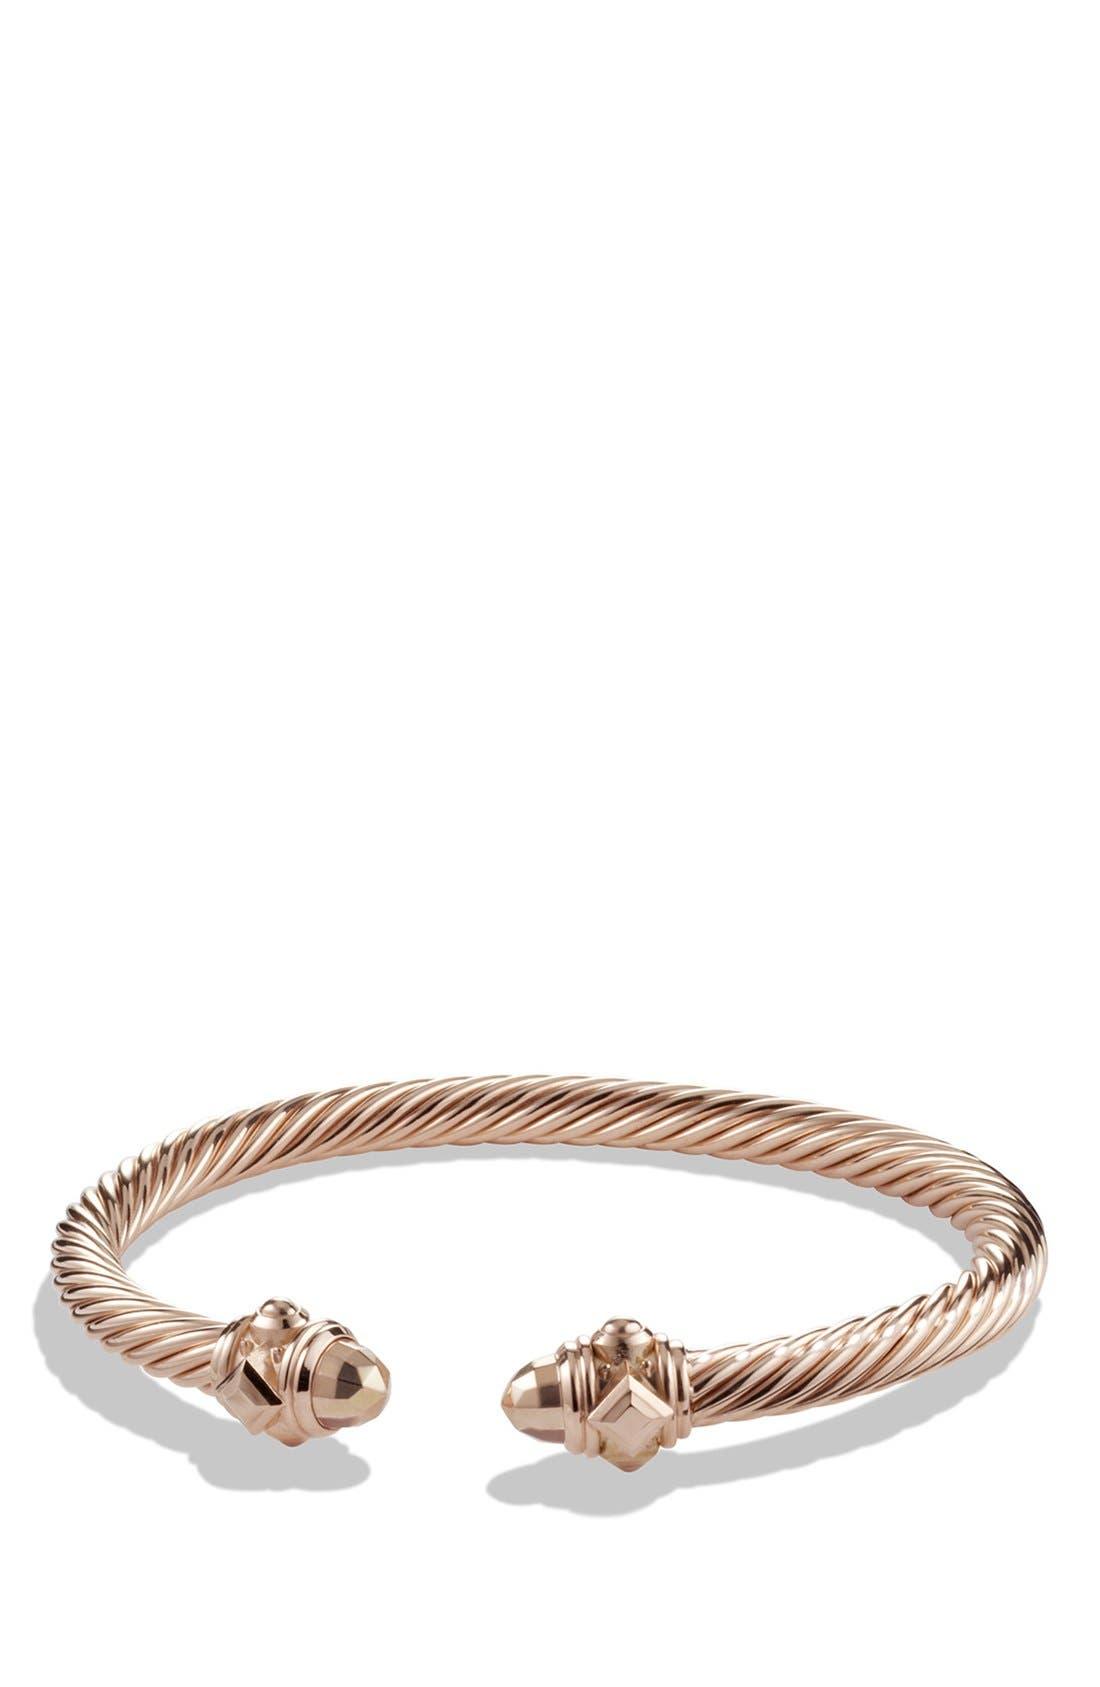 Renaissance Bracelet in 18K Rose Gold, 5mm,                             Main thumbnail 1, color,                             ROSE GOLD